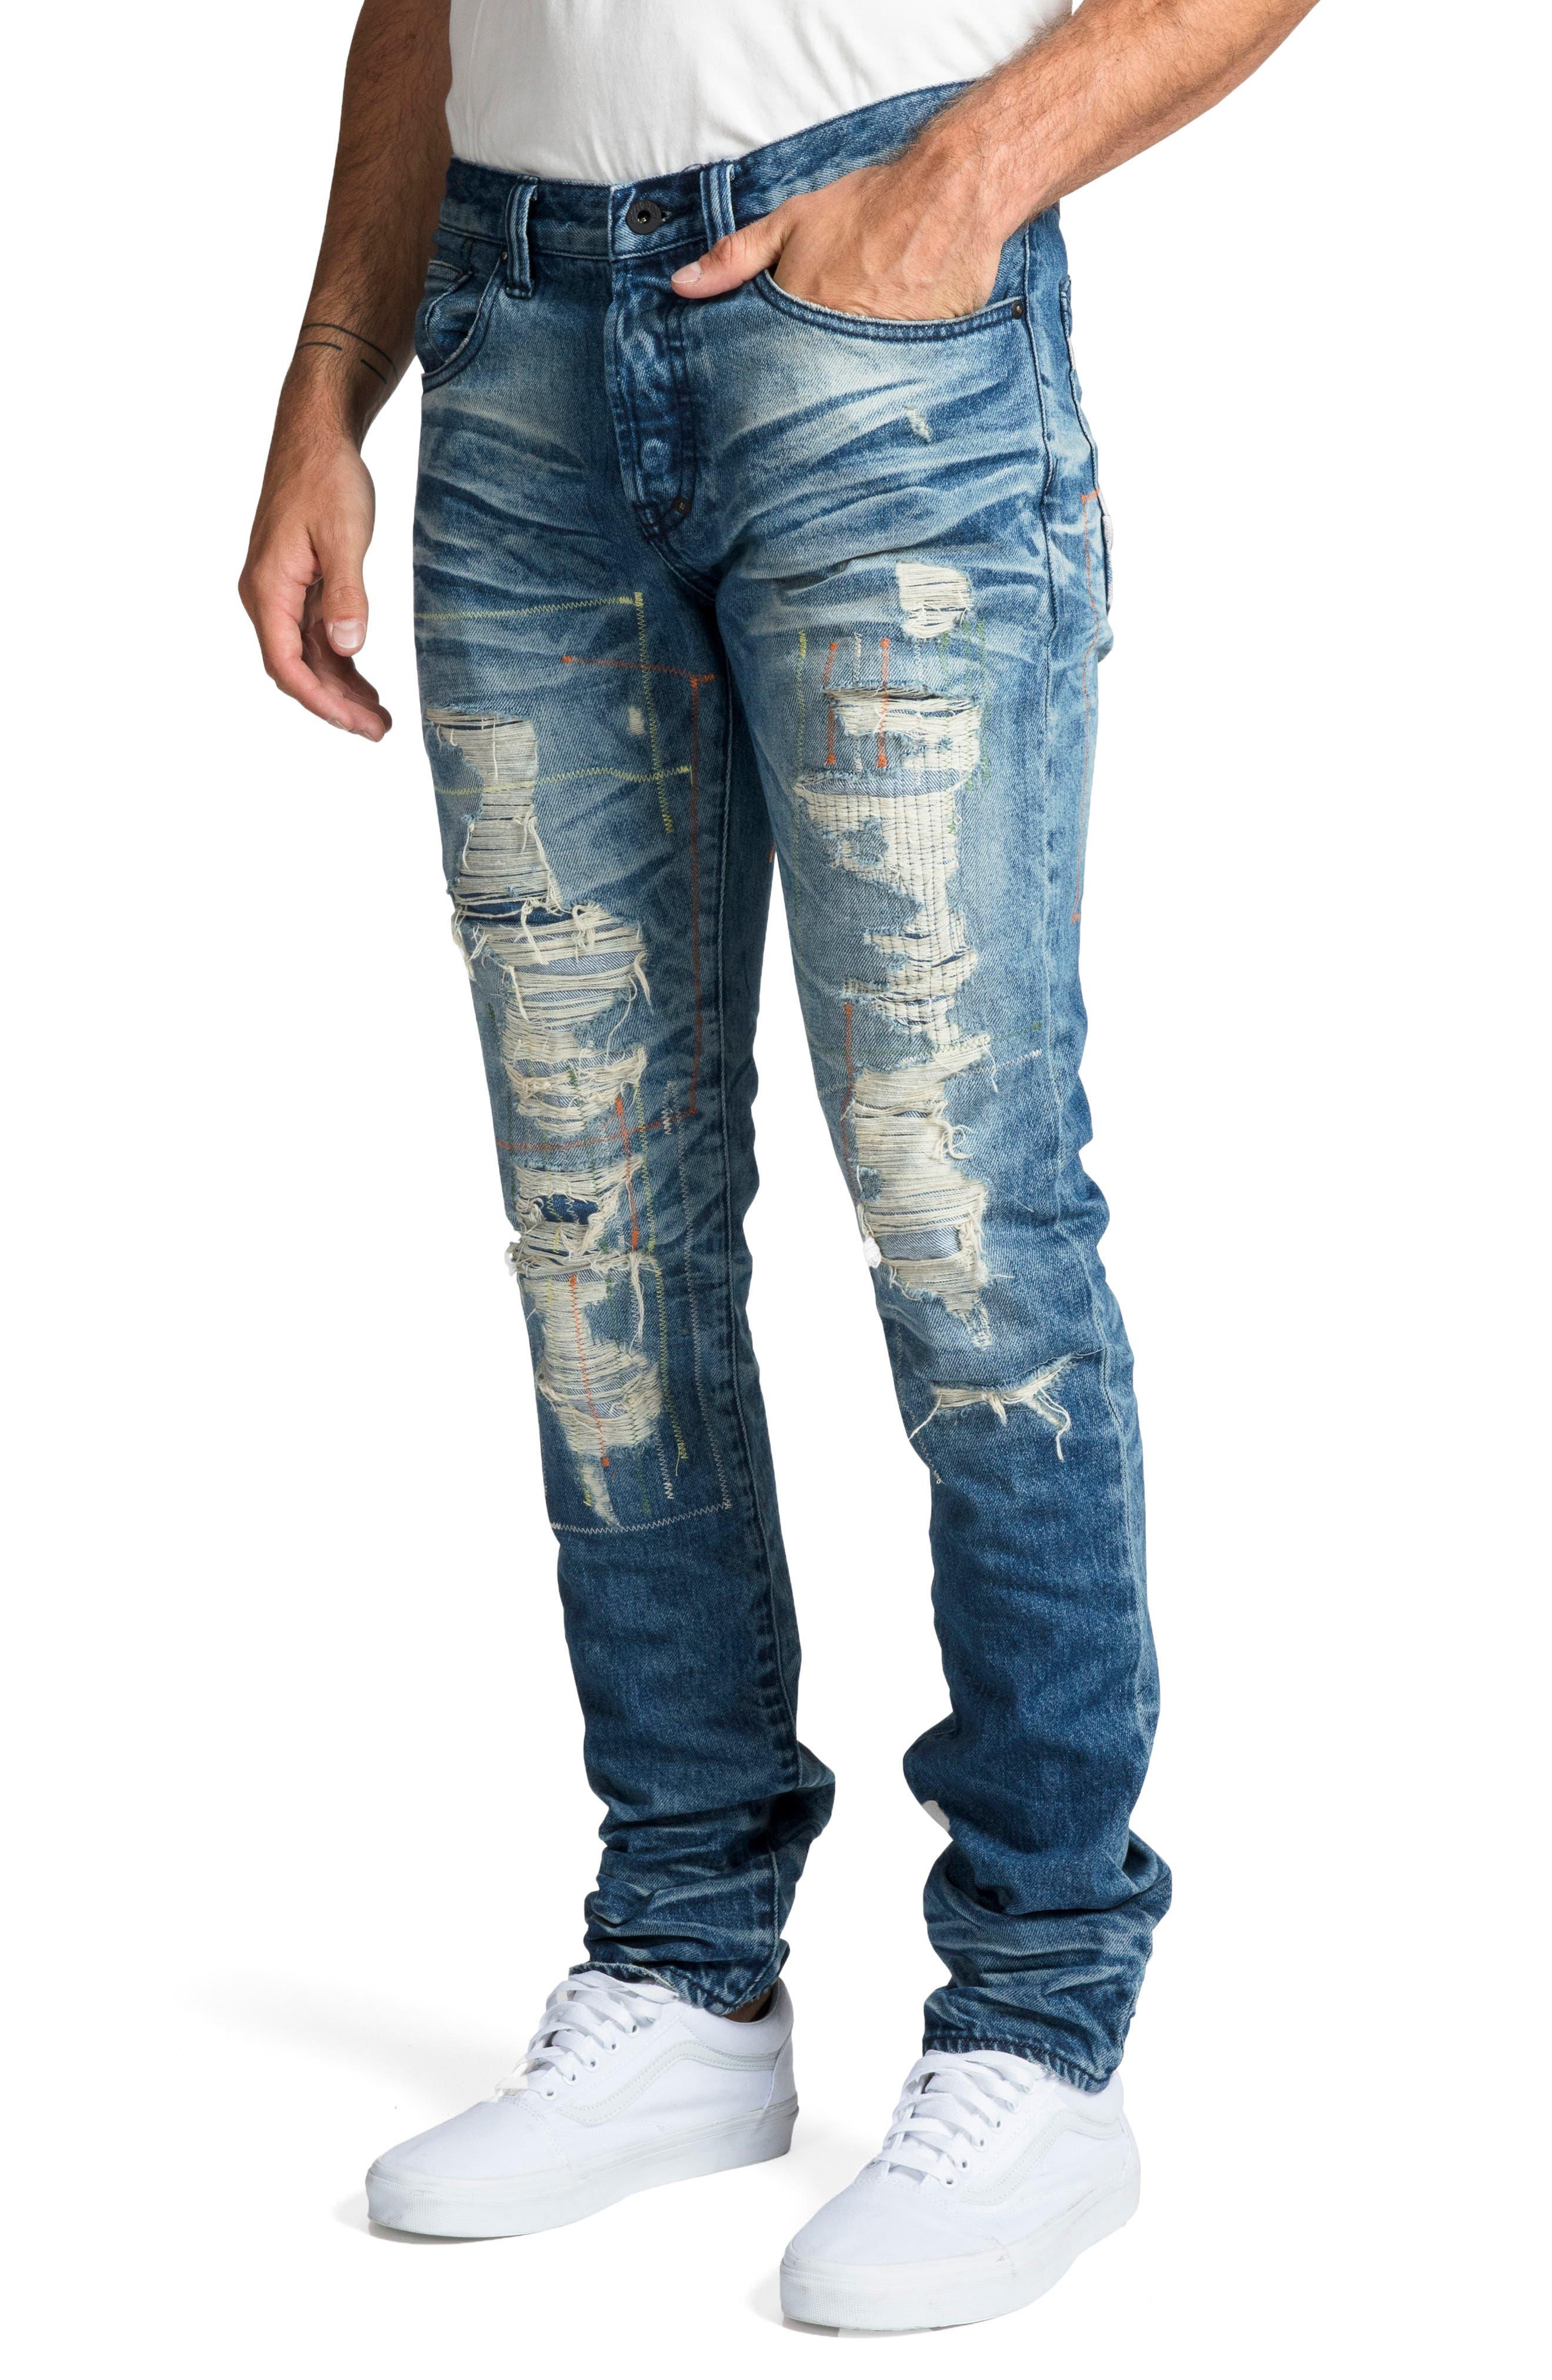 Le Sabre Slim Fit Jeans,                             Alternate thumbnail 3, color,                             COOING